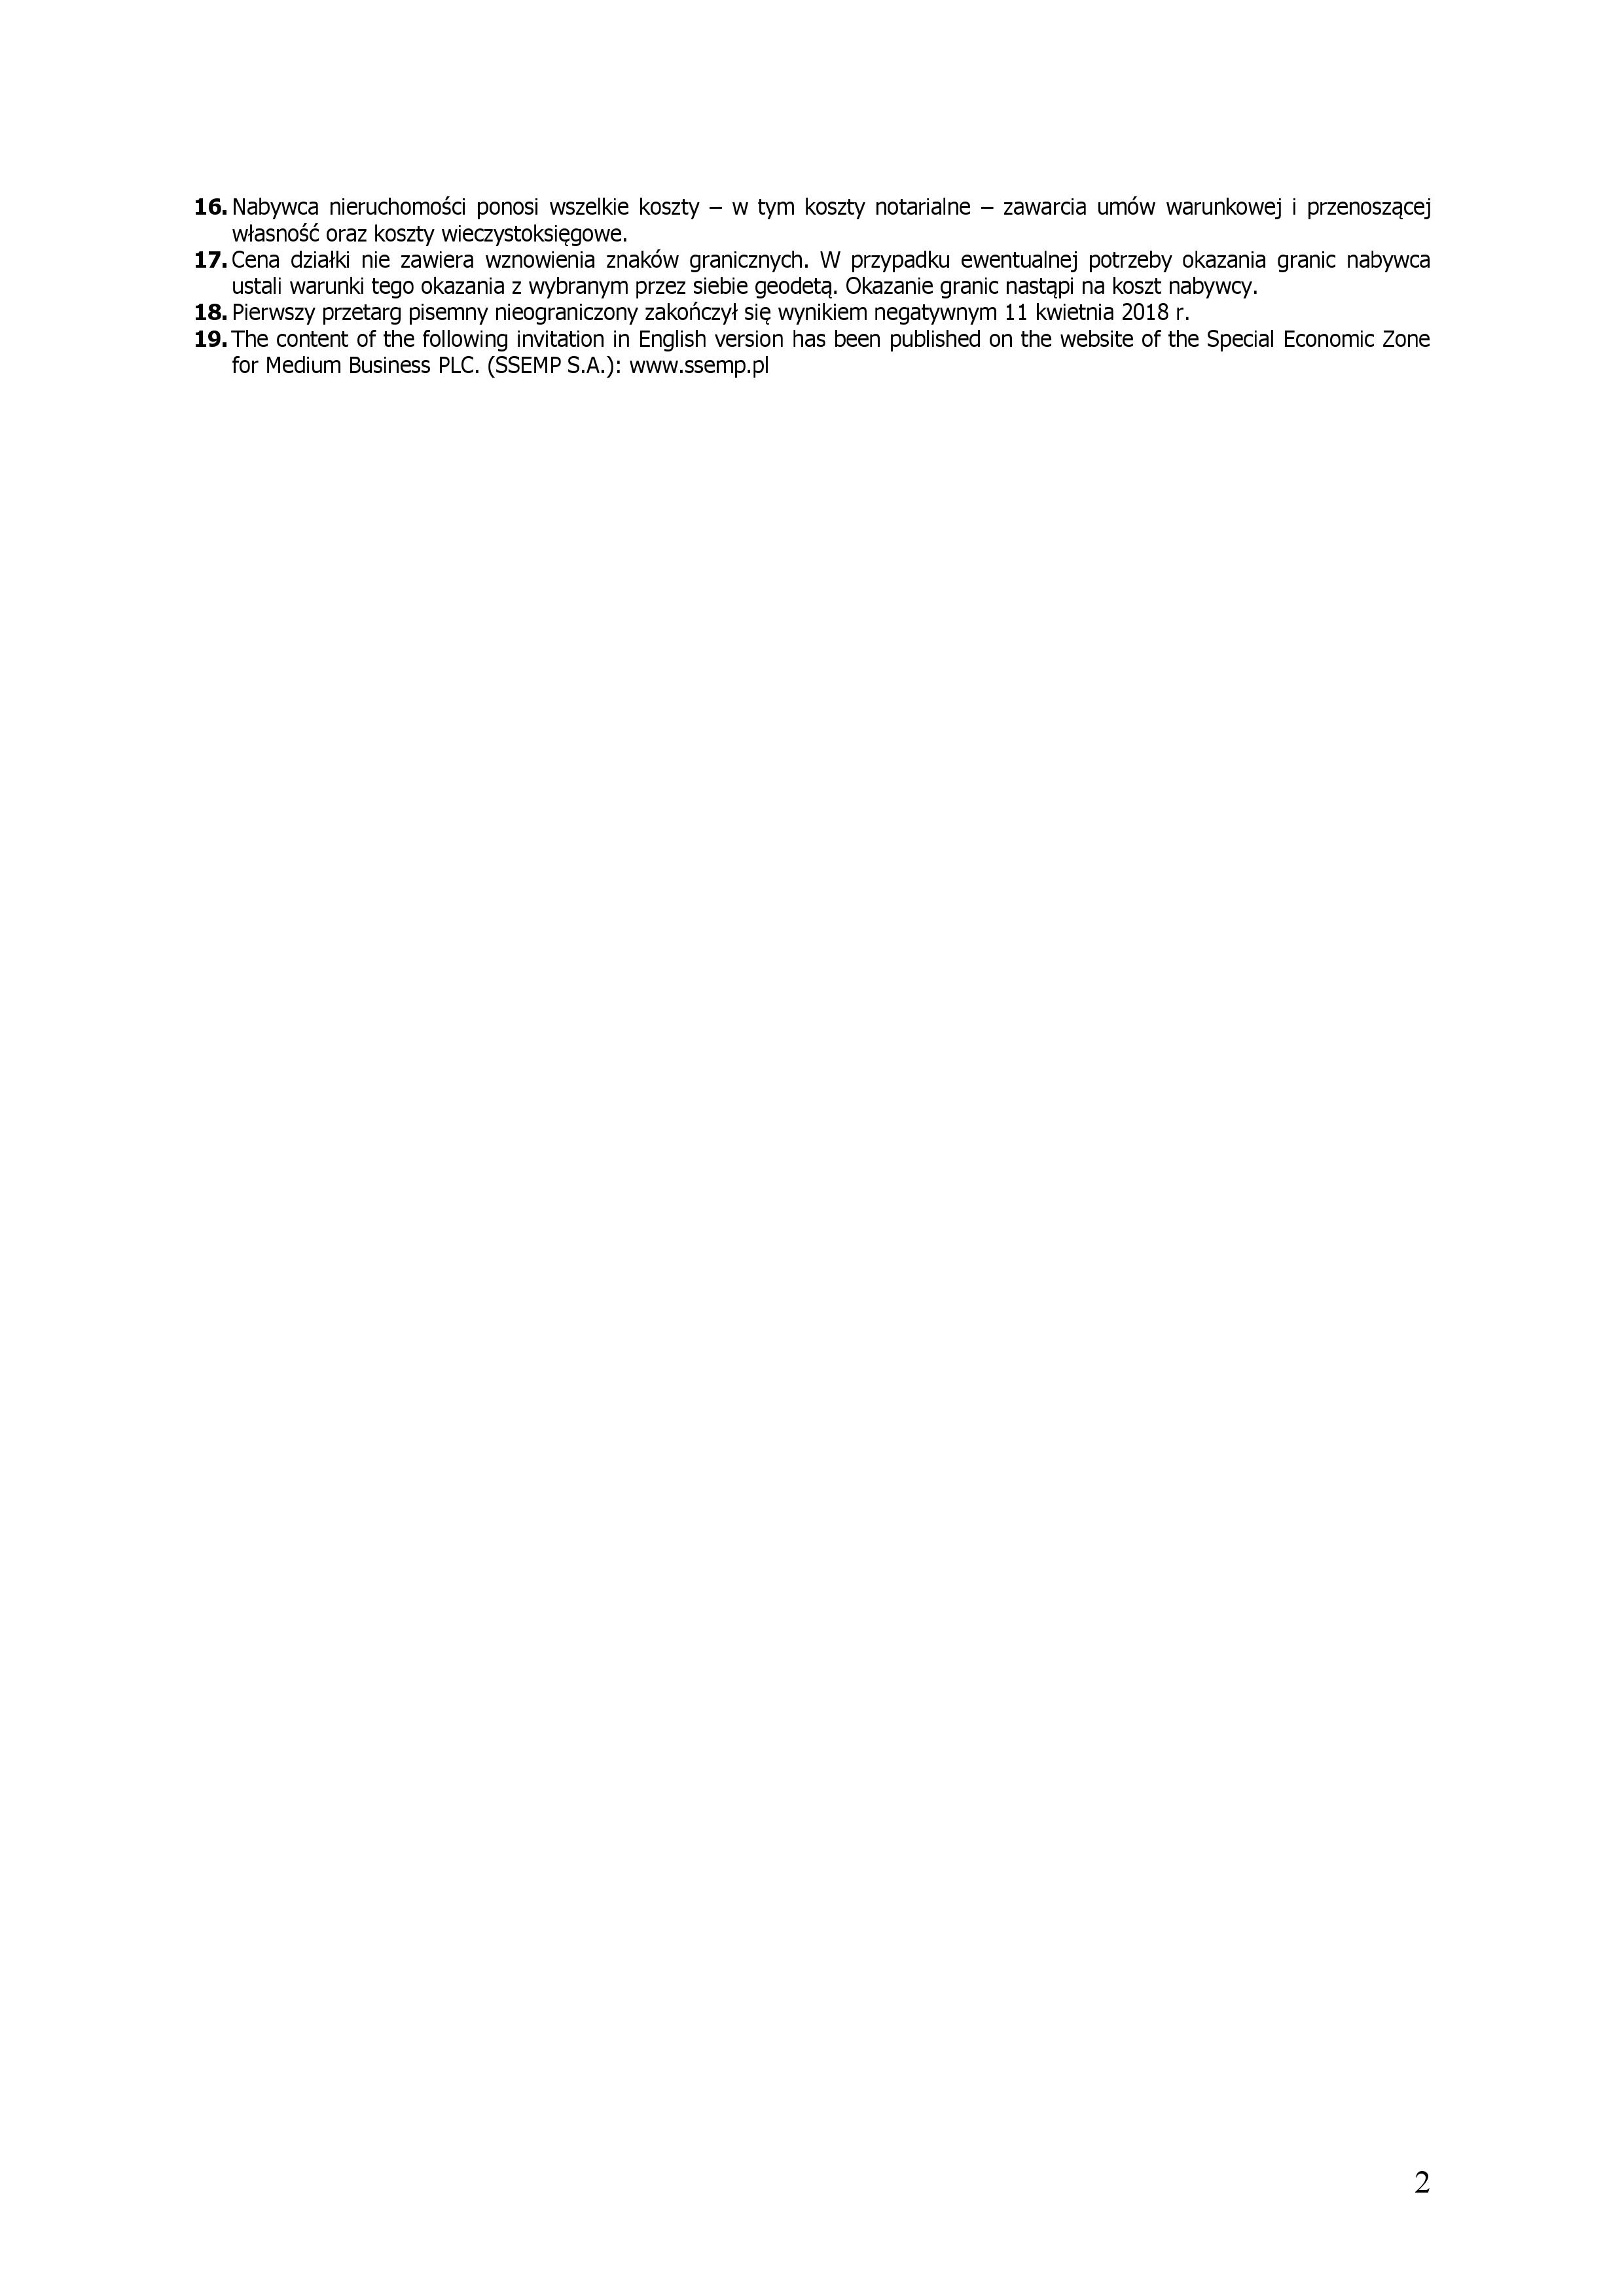 prusice przetarg 05.09 pl02